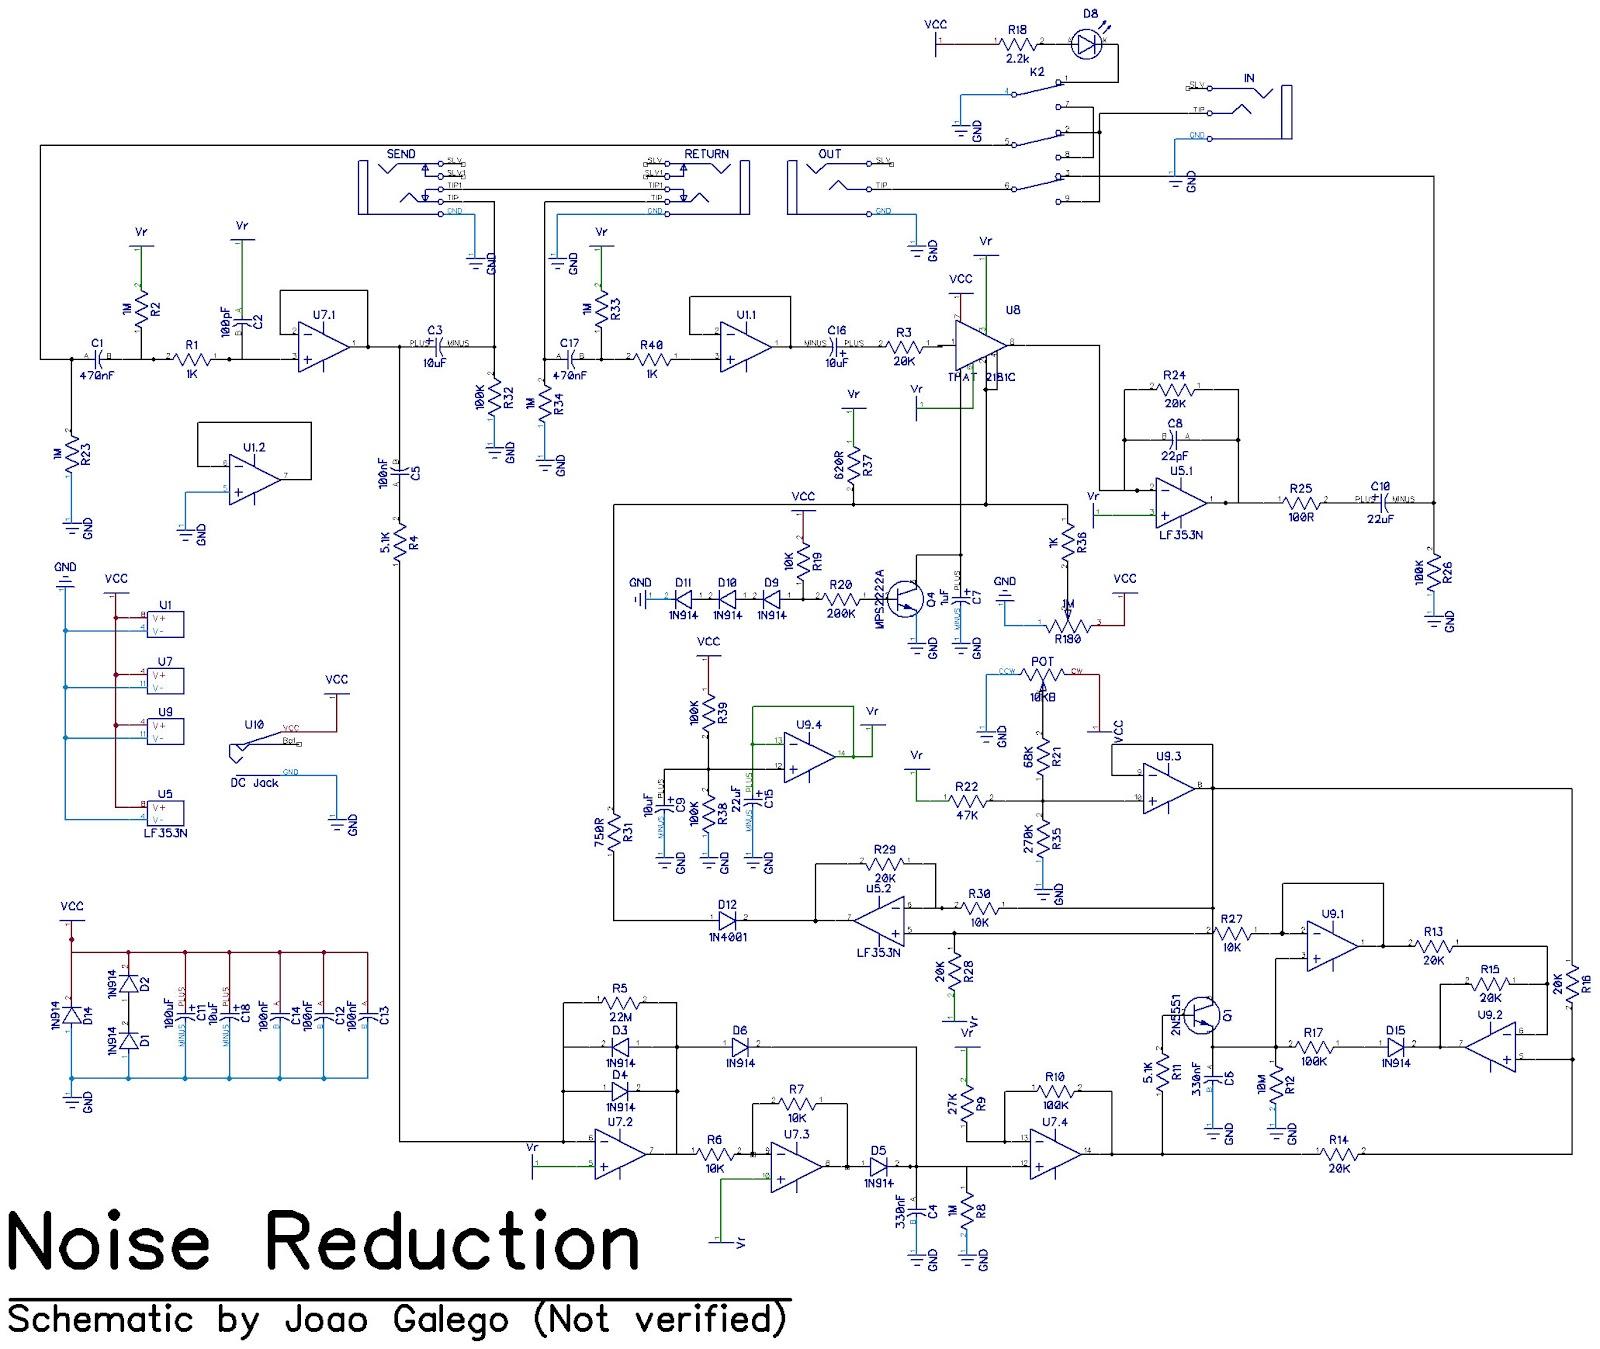 Isp Decimator Noise Reduction System La Rvolution Deux Wah Pedal Wiring Diagram